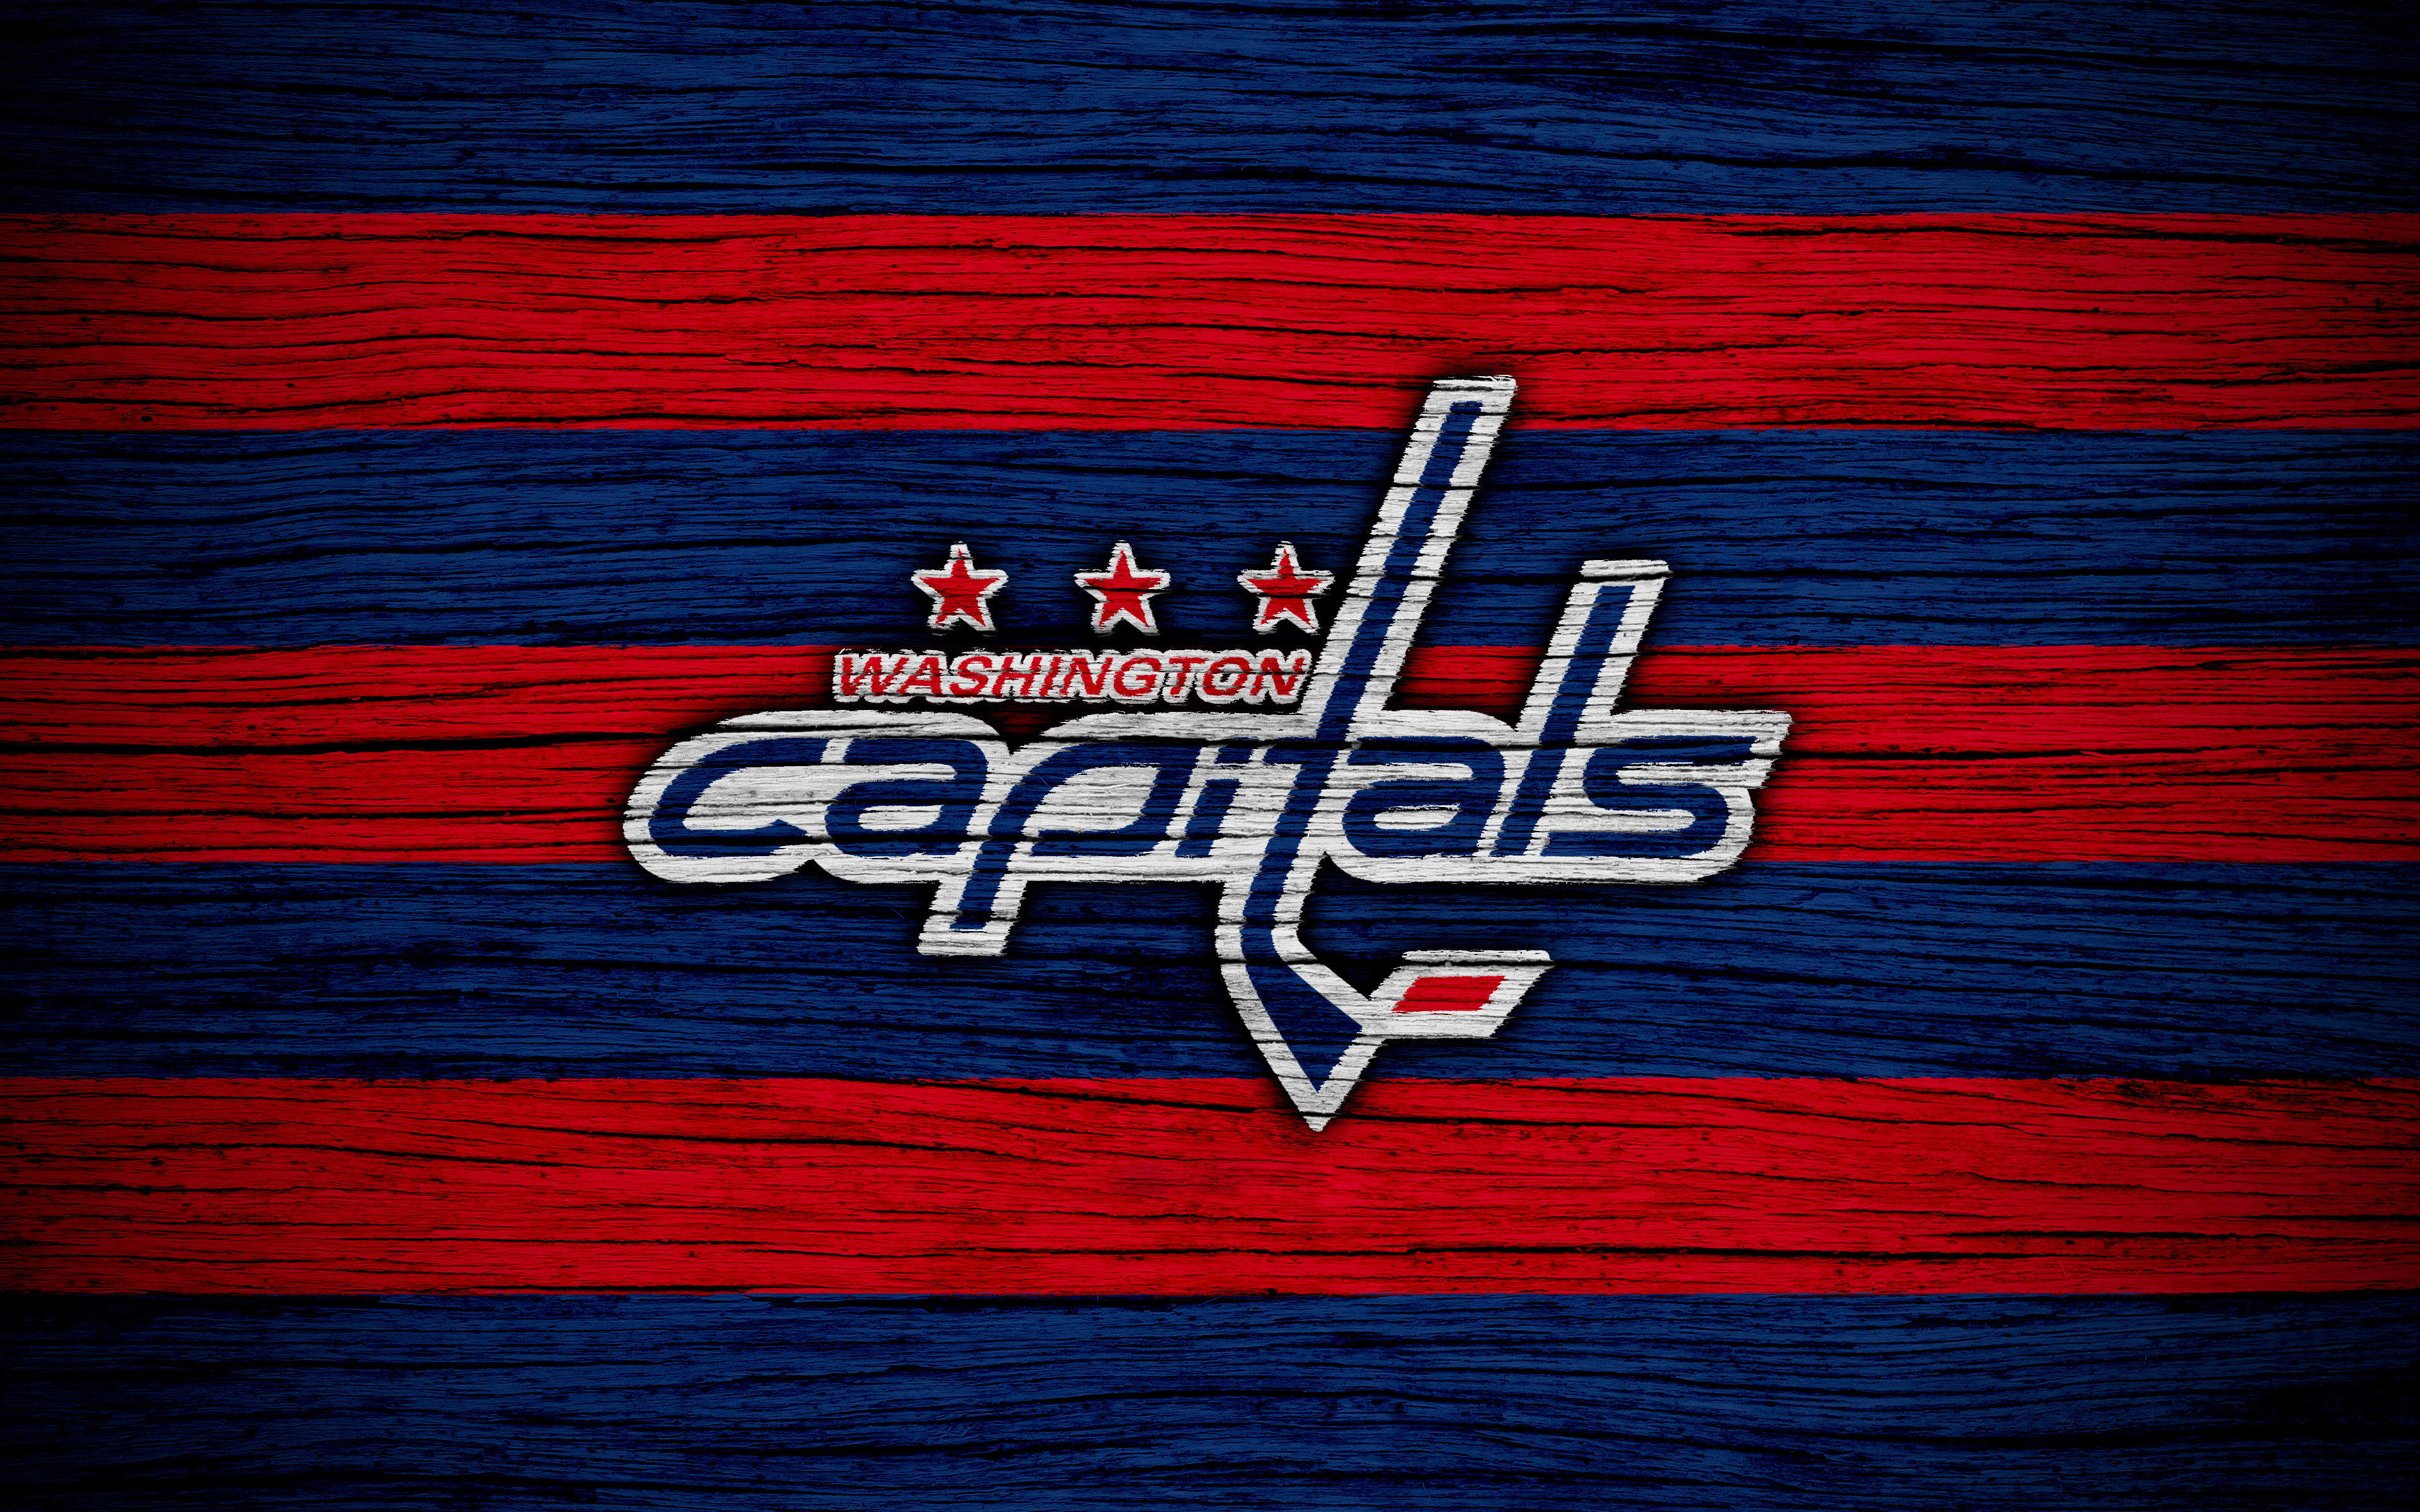 Washington Capitals 4k Ultra HD Wallpaper Background Image 3840x2400